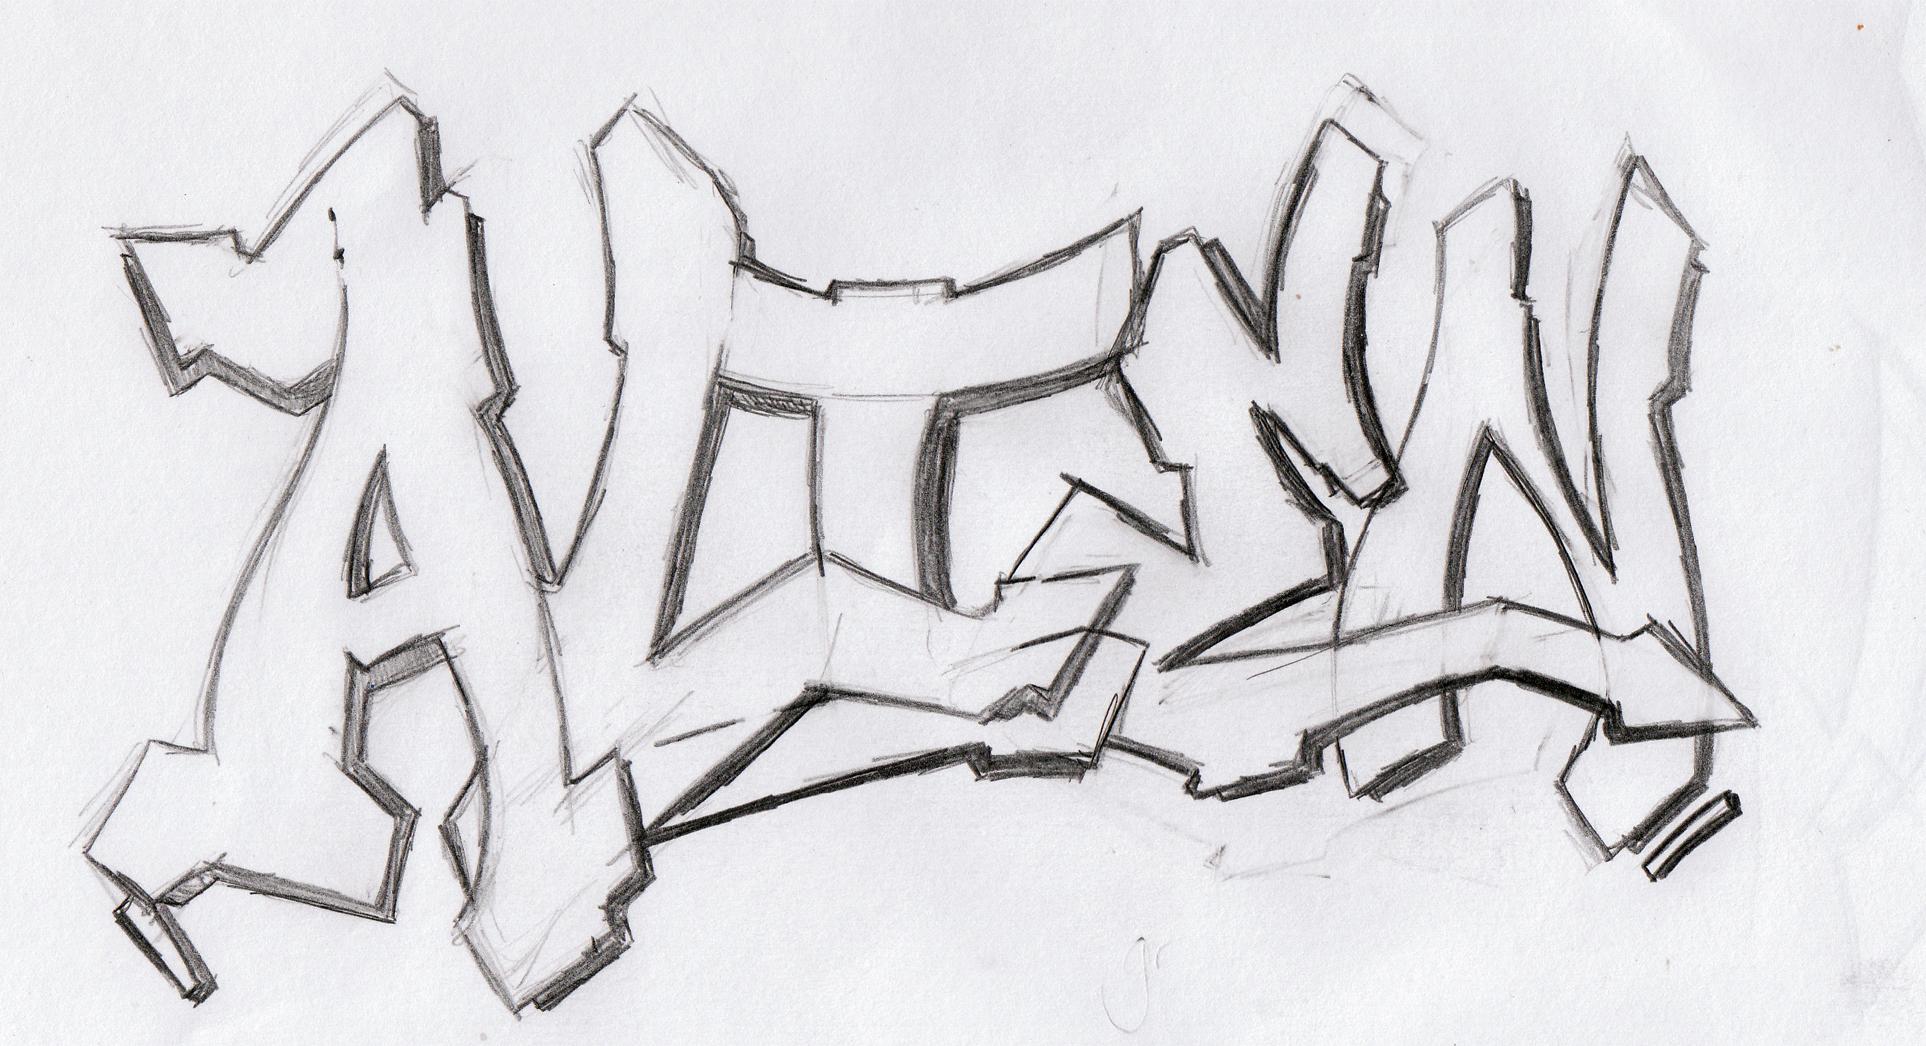 Developing My Own Graffiti Style